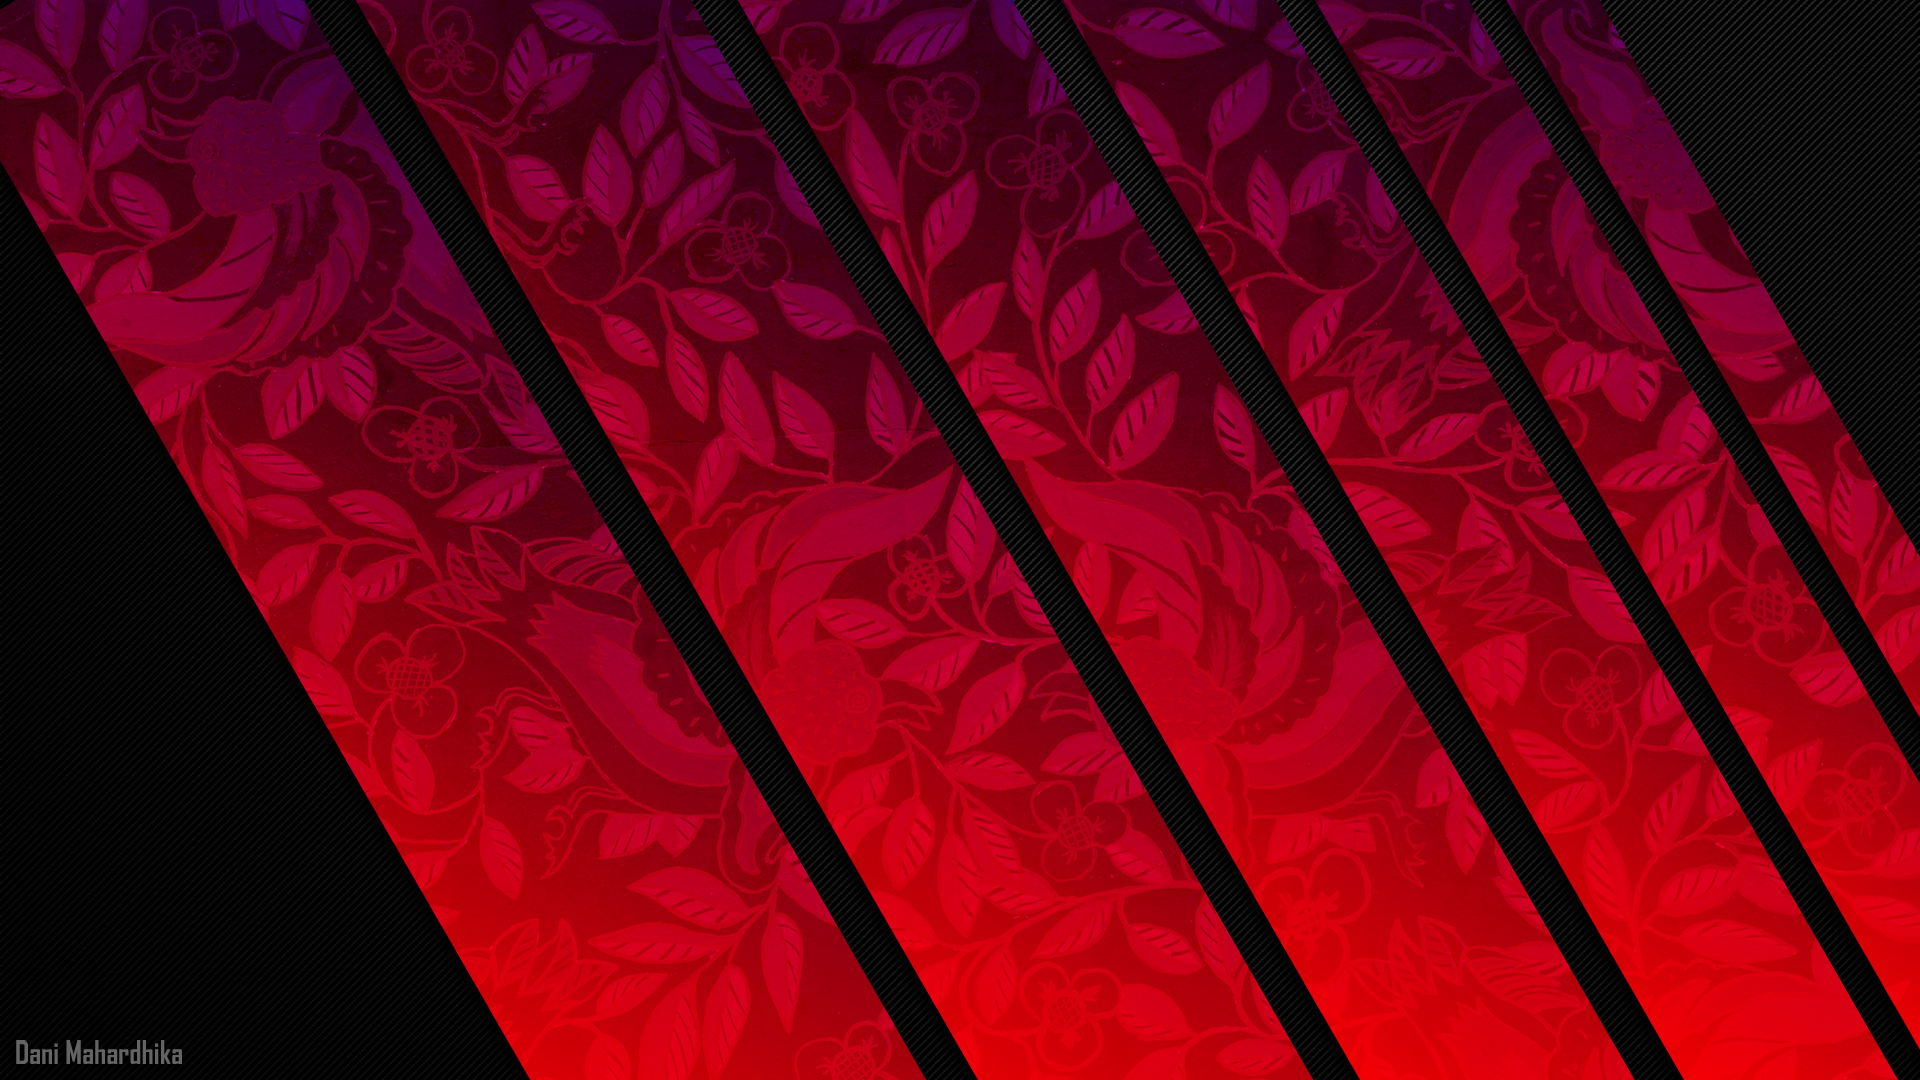 kain batik batik adalah pakaian asli jawa tengah